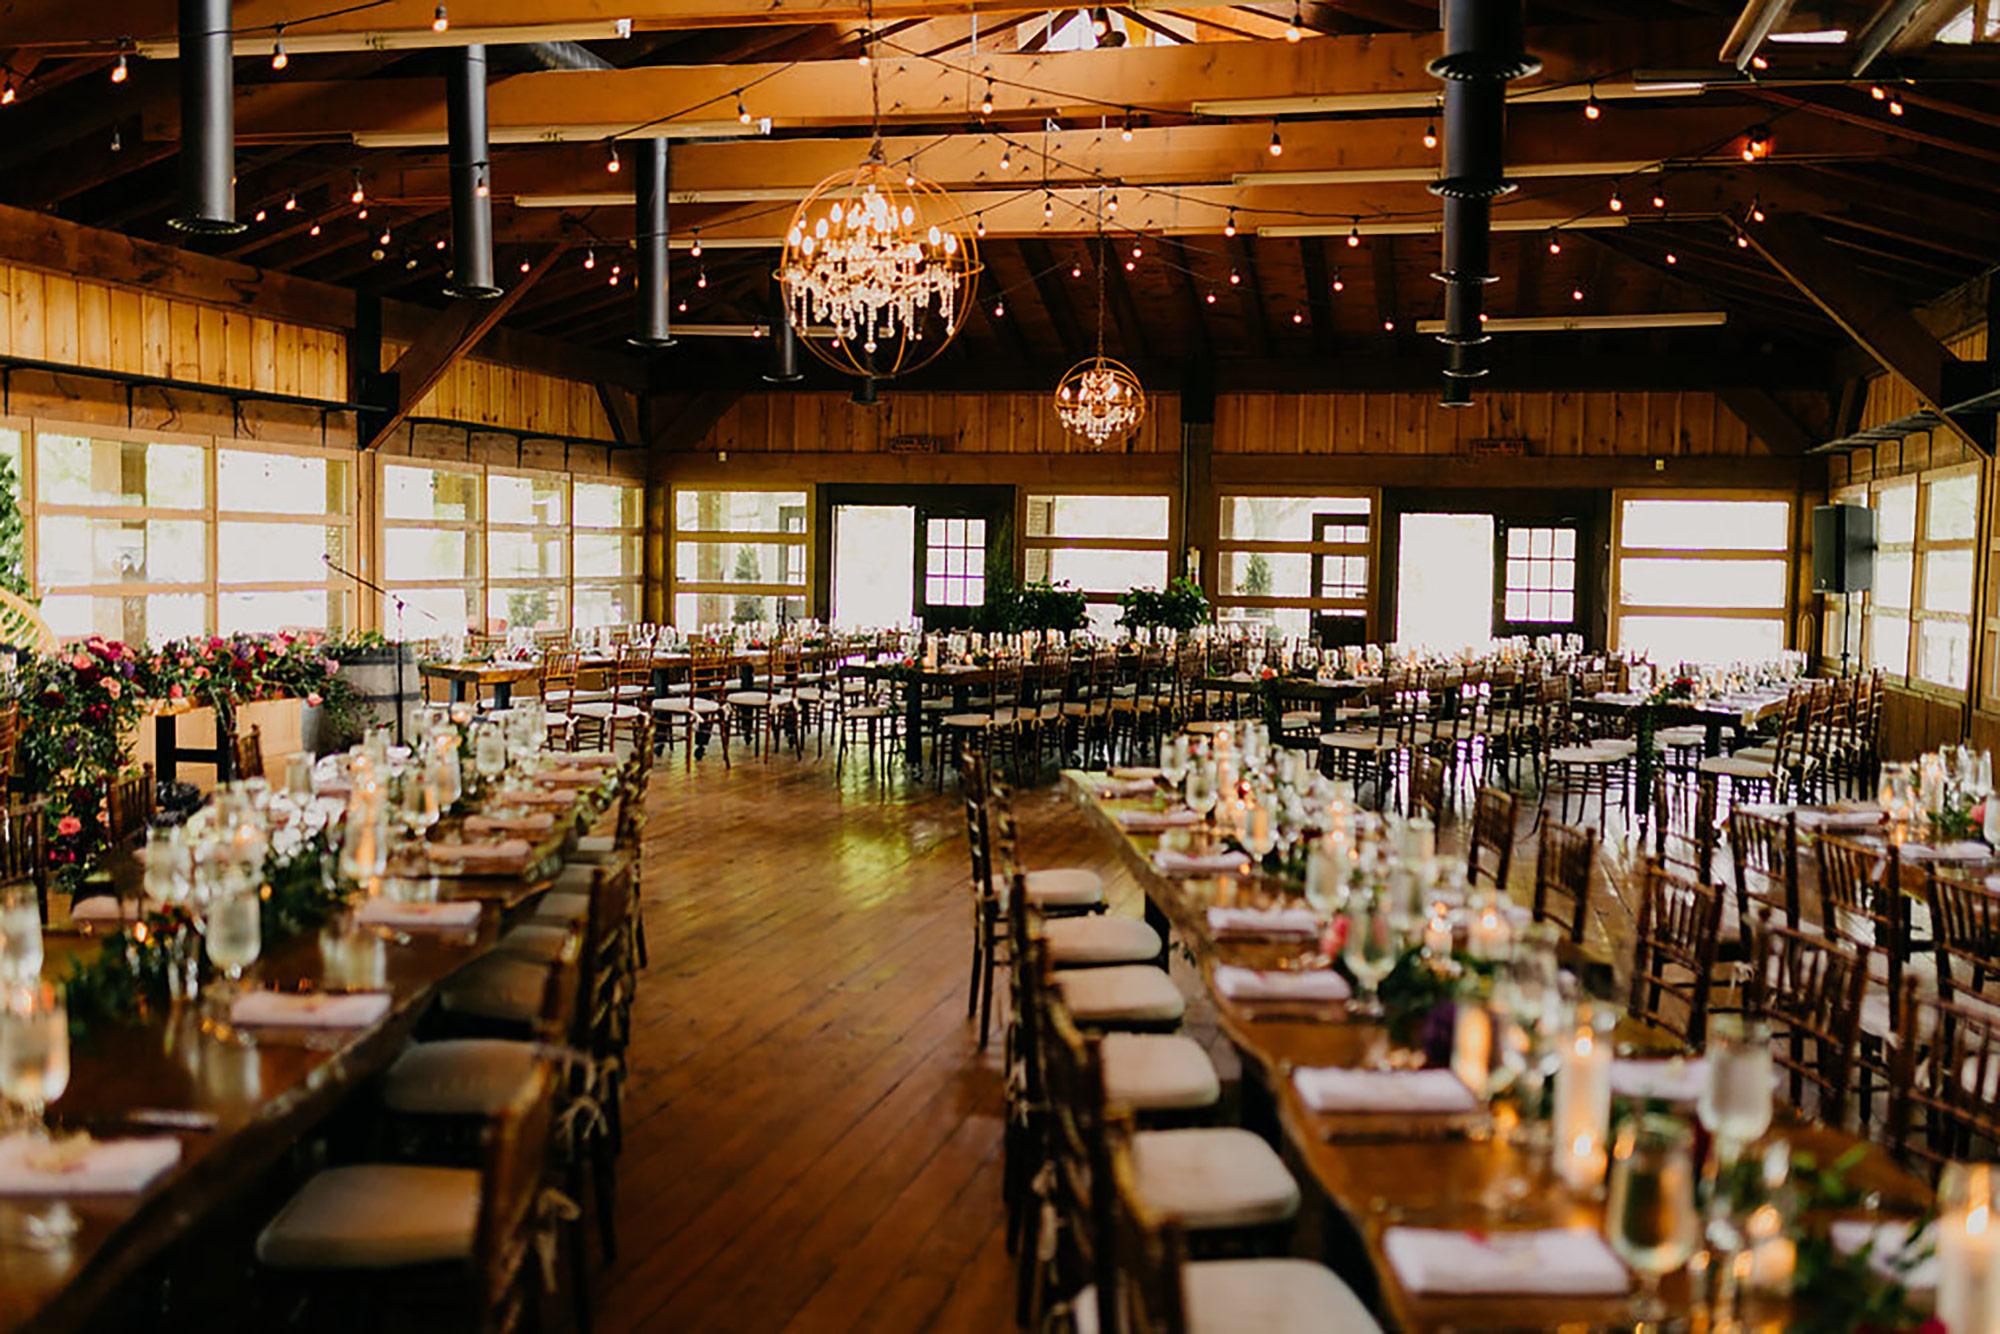 Kurtz-Orchards-Wedding-Niagara-wedding-Vineyard-Bride-Photography-by-Kayla-Rocca-042.JPG